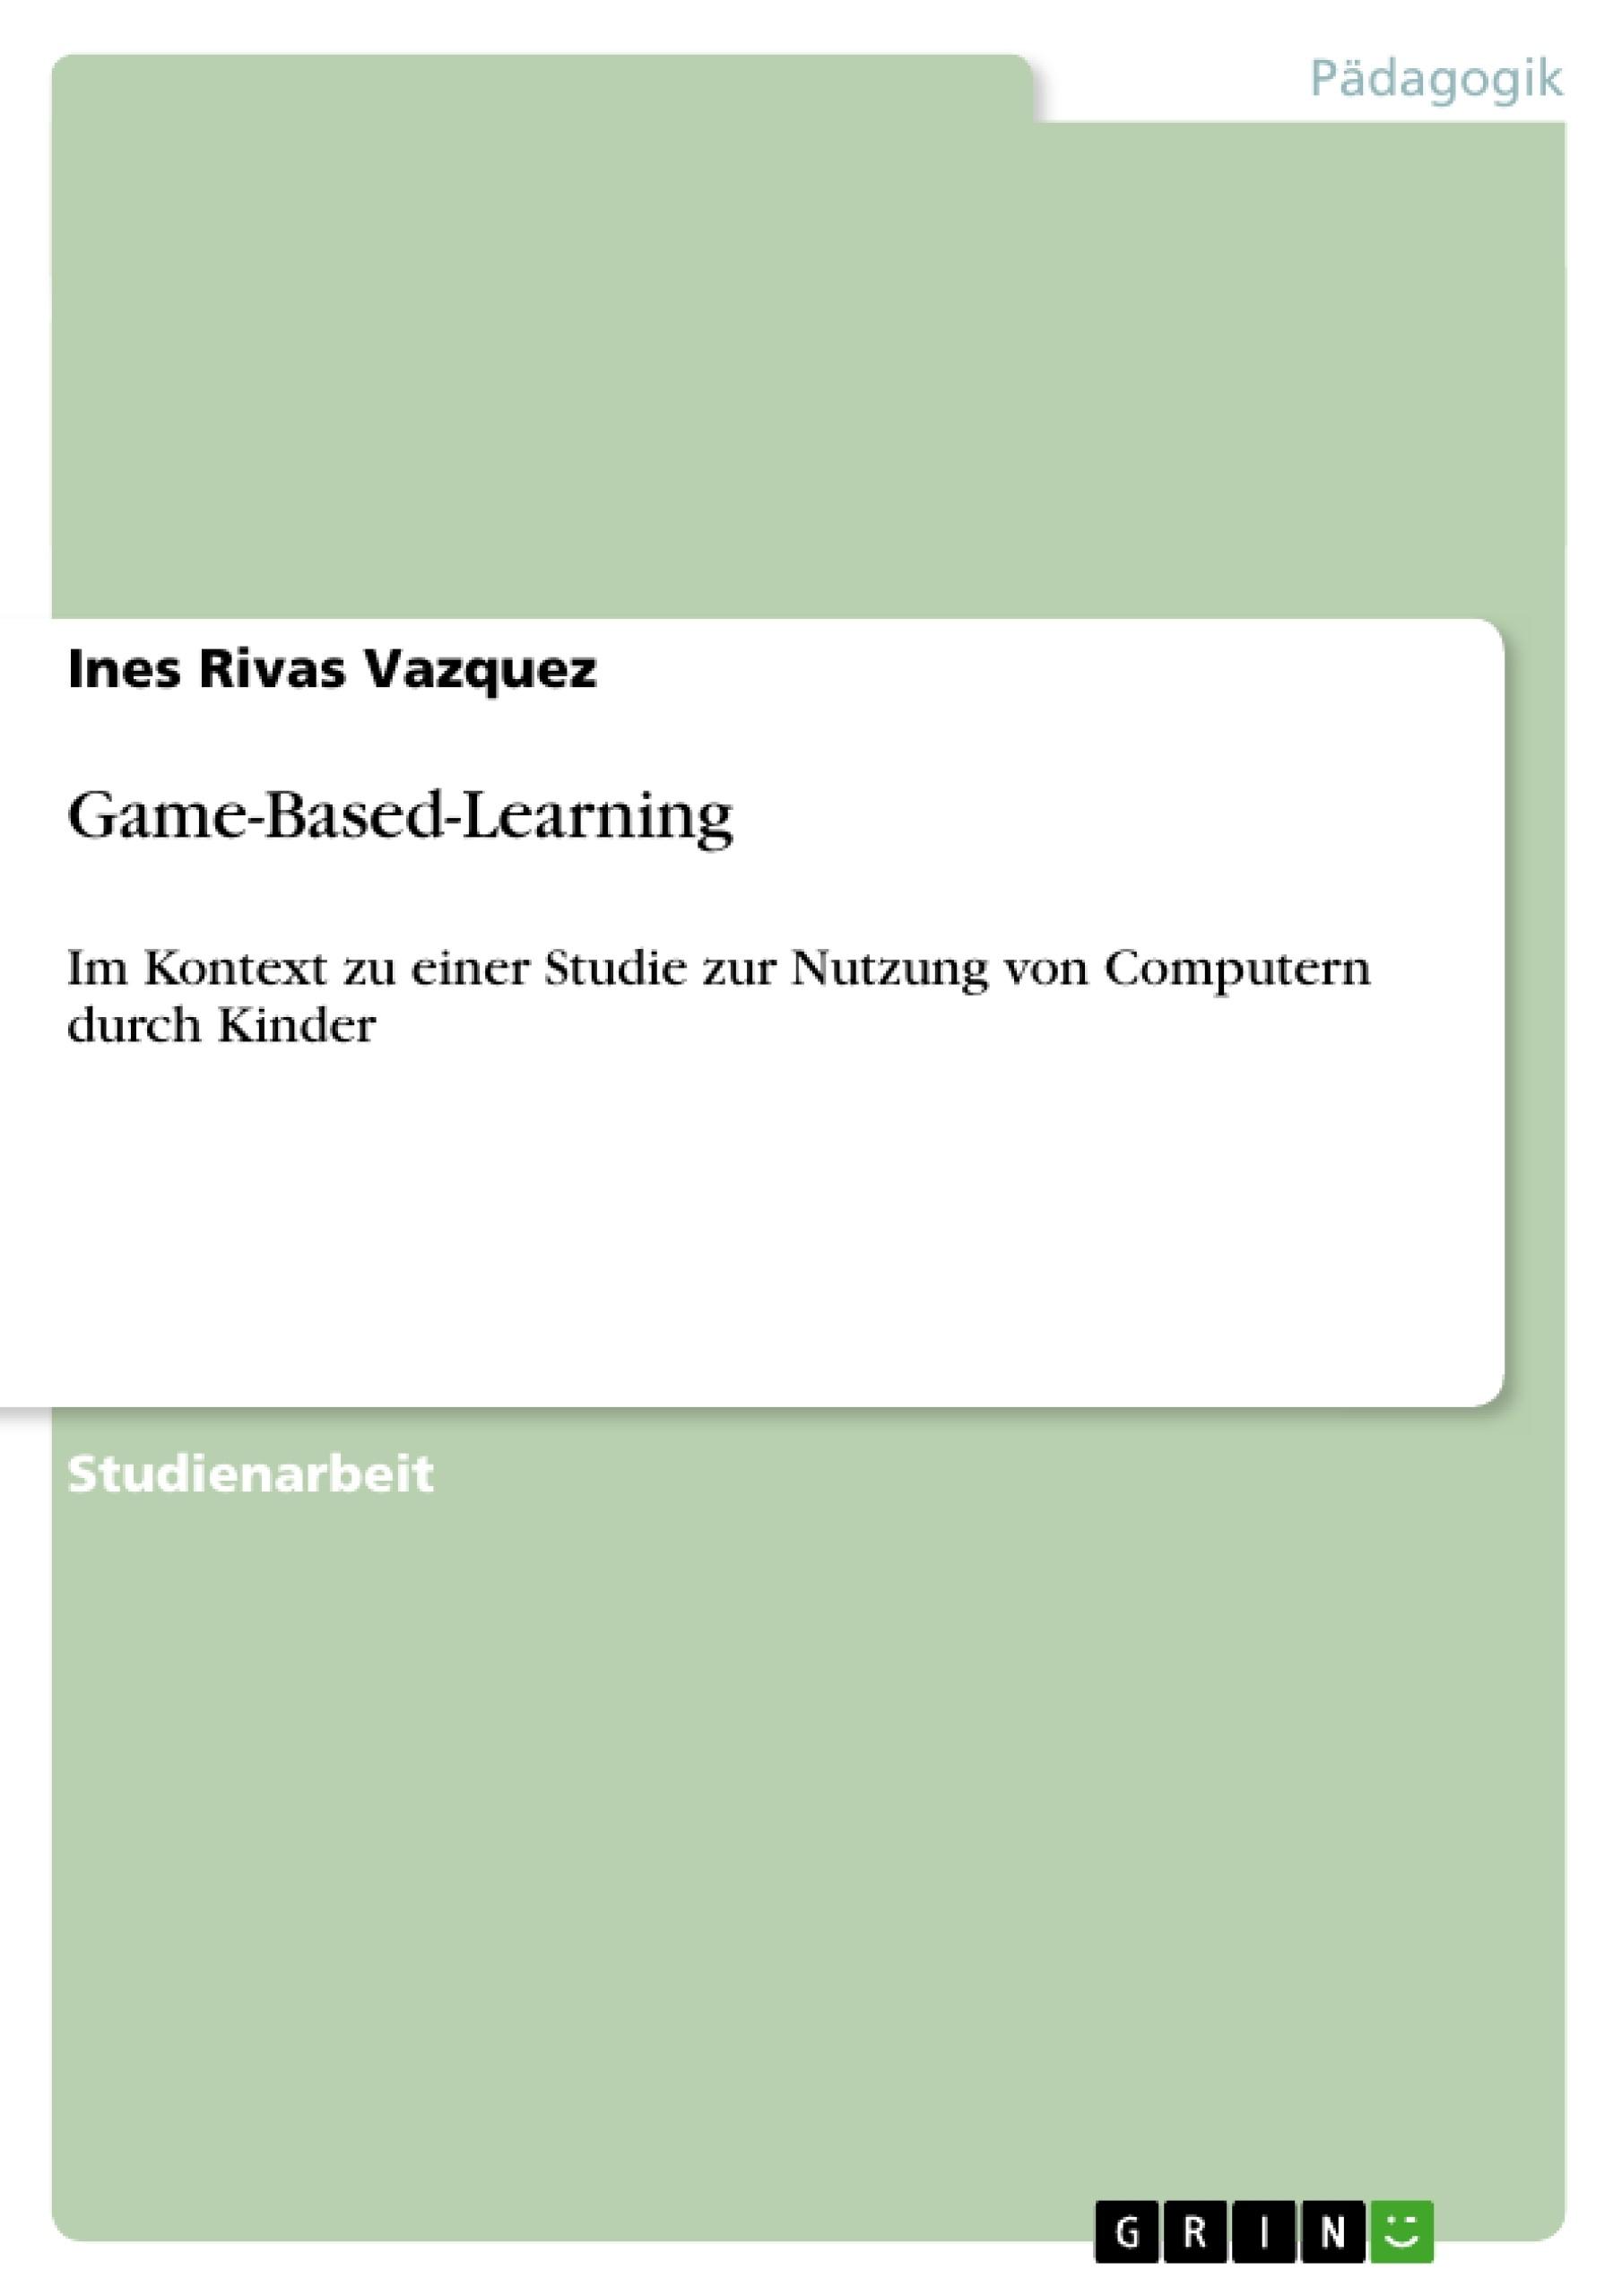 Titel: Game-Based-Learning